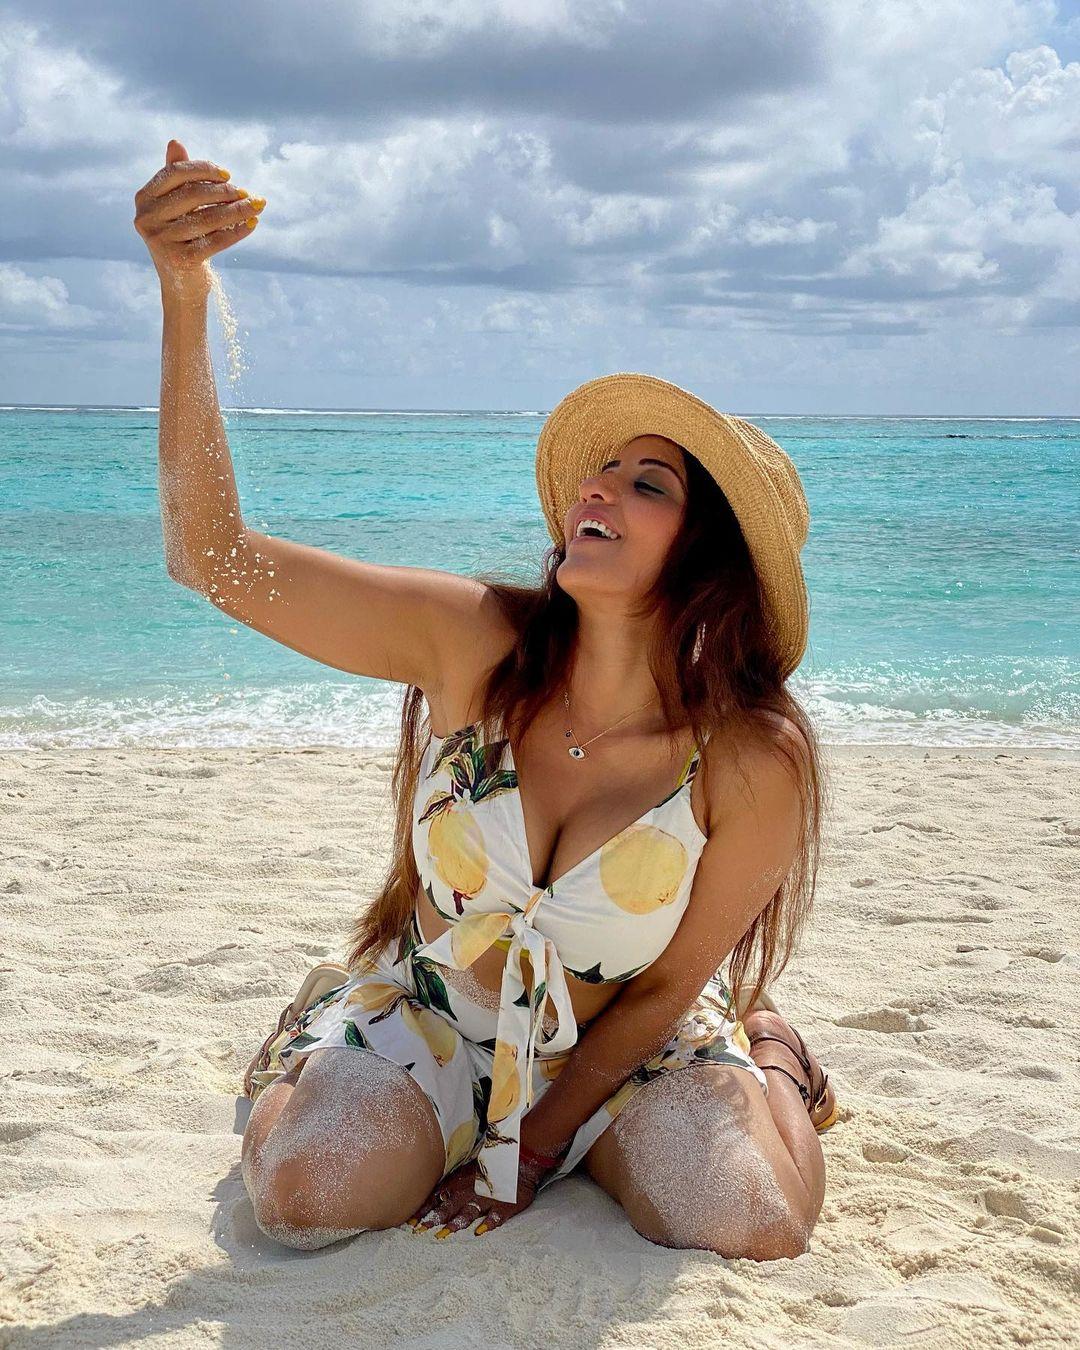 Monalisa Bikini Photos